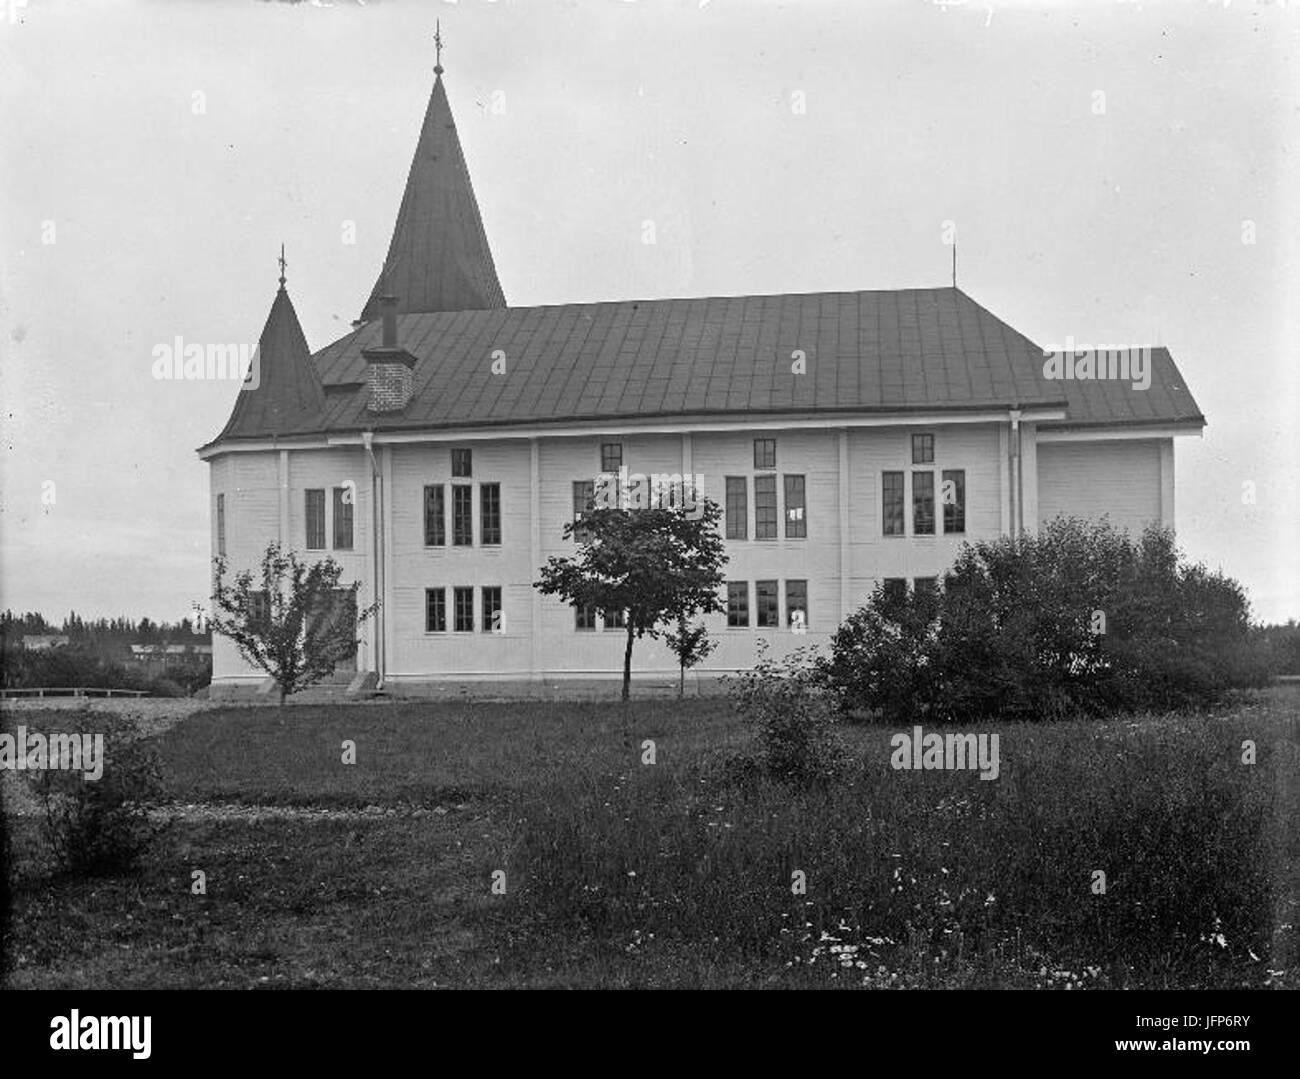 Byske-Fllfors frsamling - Fllfors kyrka - unam.net